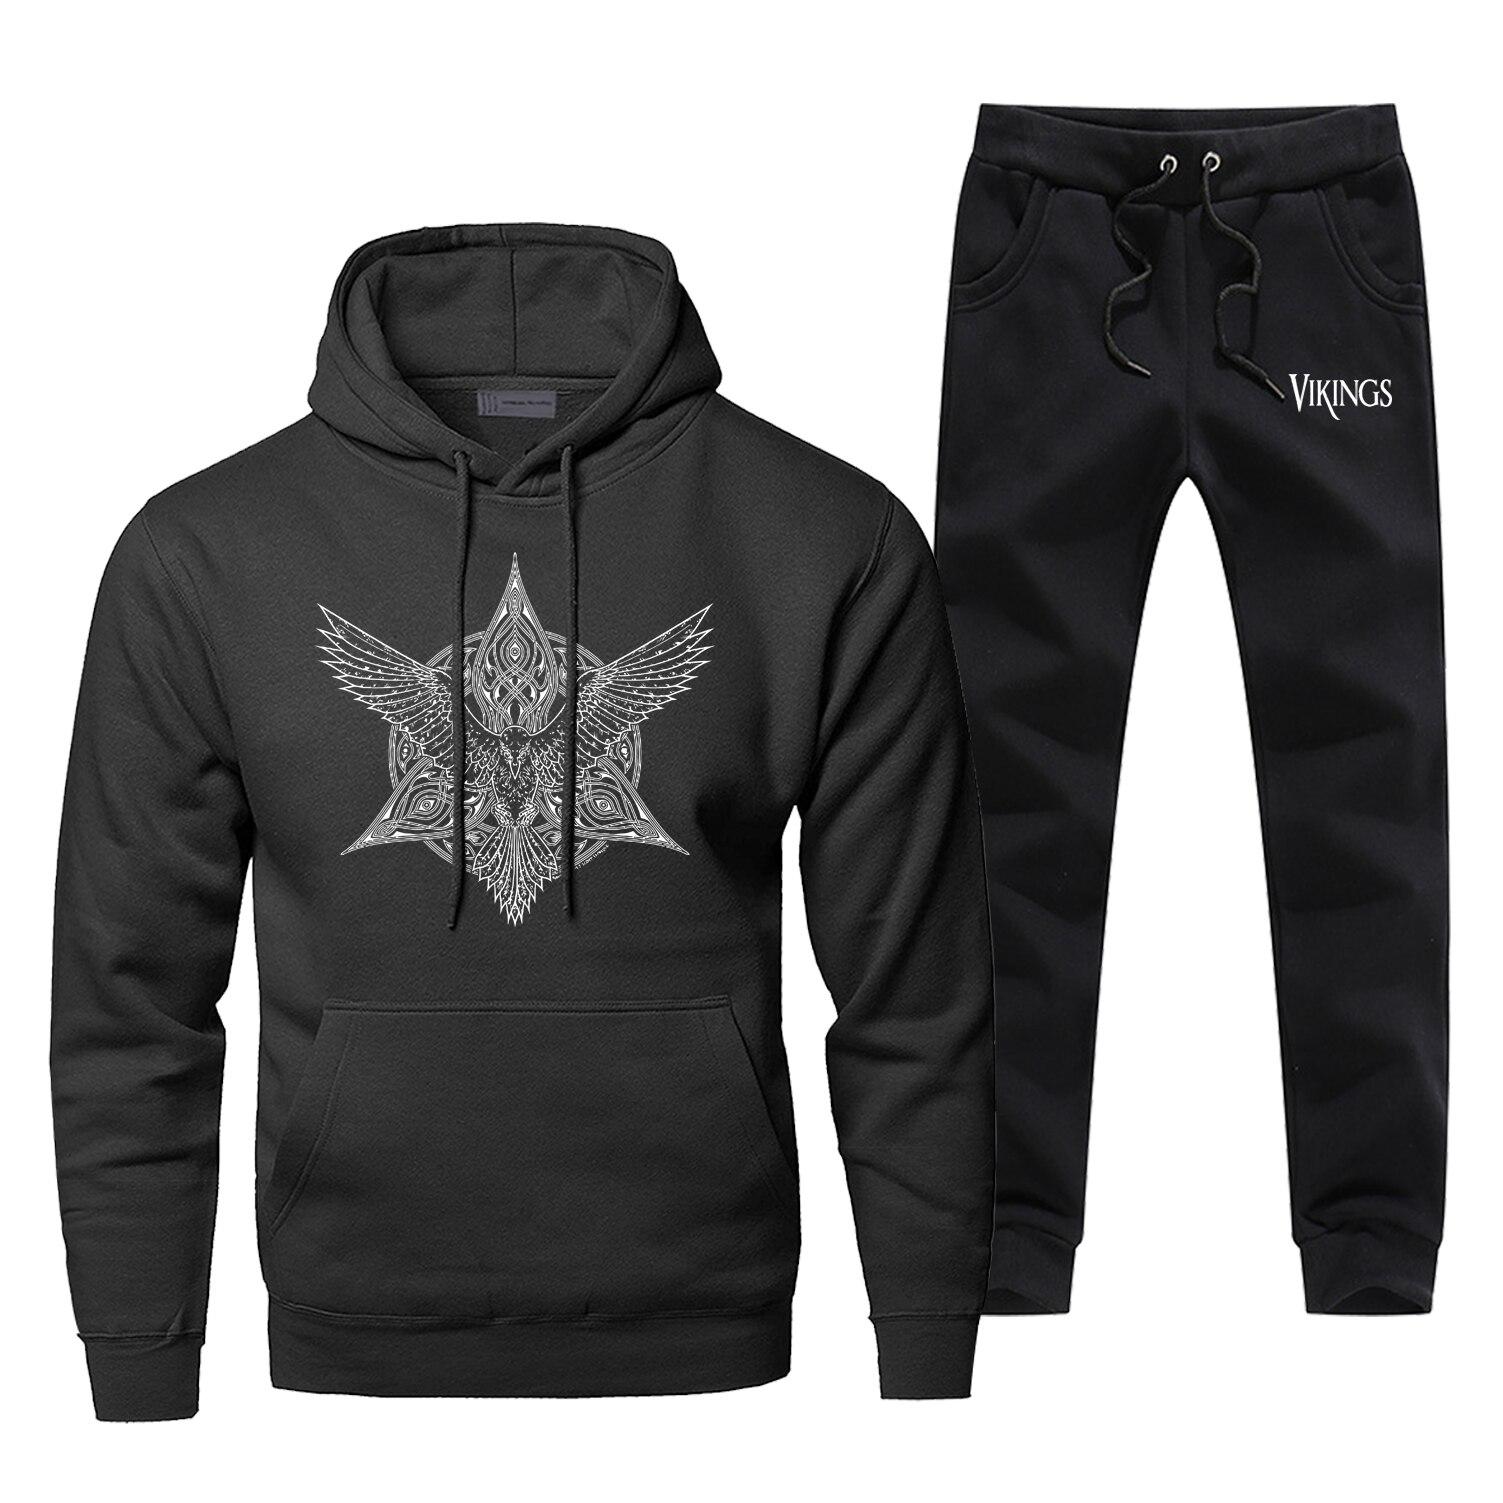 Tv Show Odin Viking Gone To Valhalla Hoodie Men Vikings Hoodie Vintage Sweatshirt Winter Harajuku Streetwear Fleece Sportswear